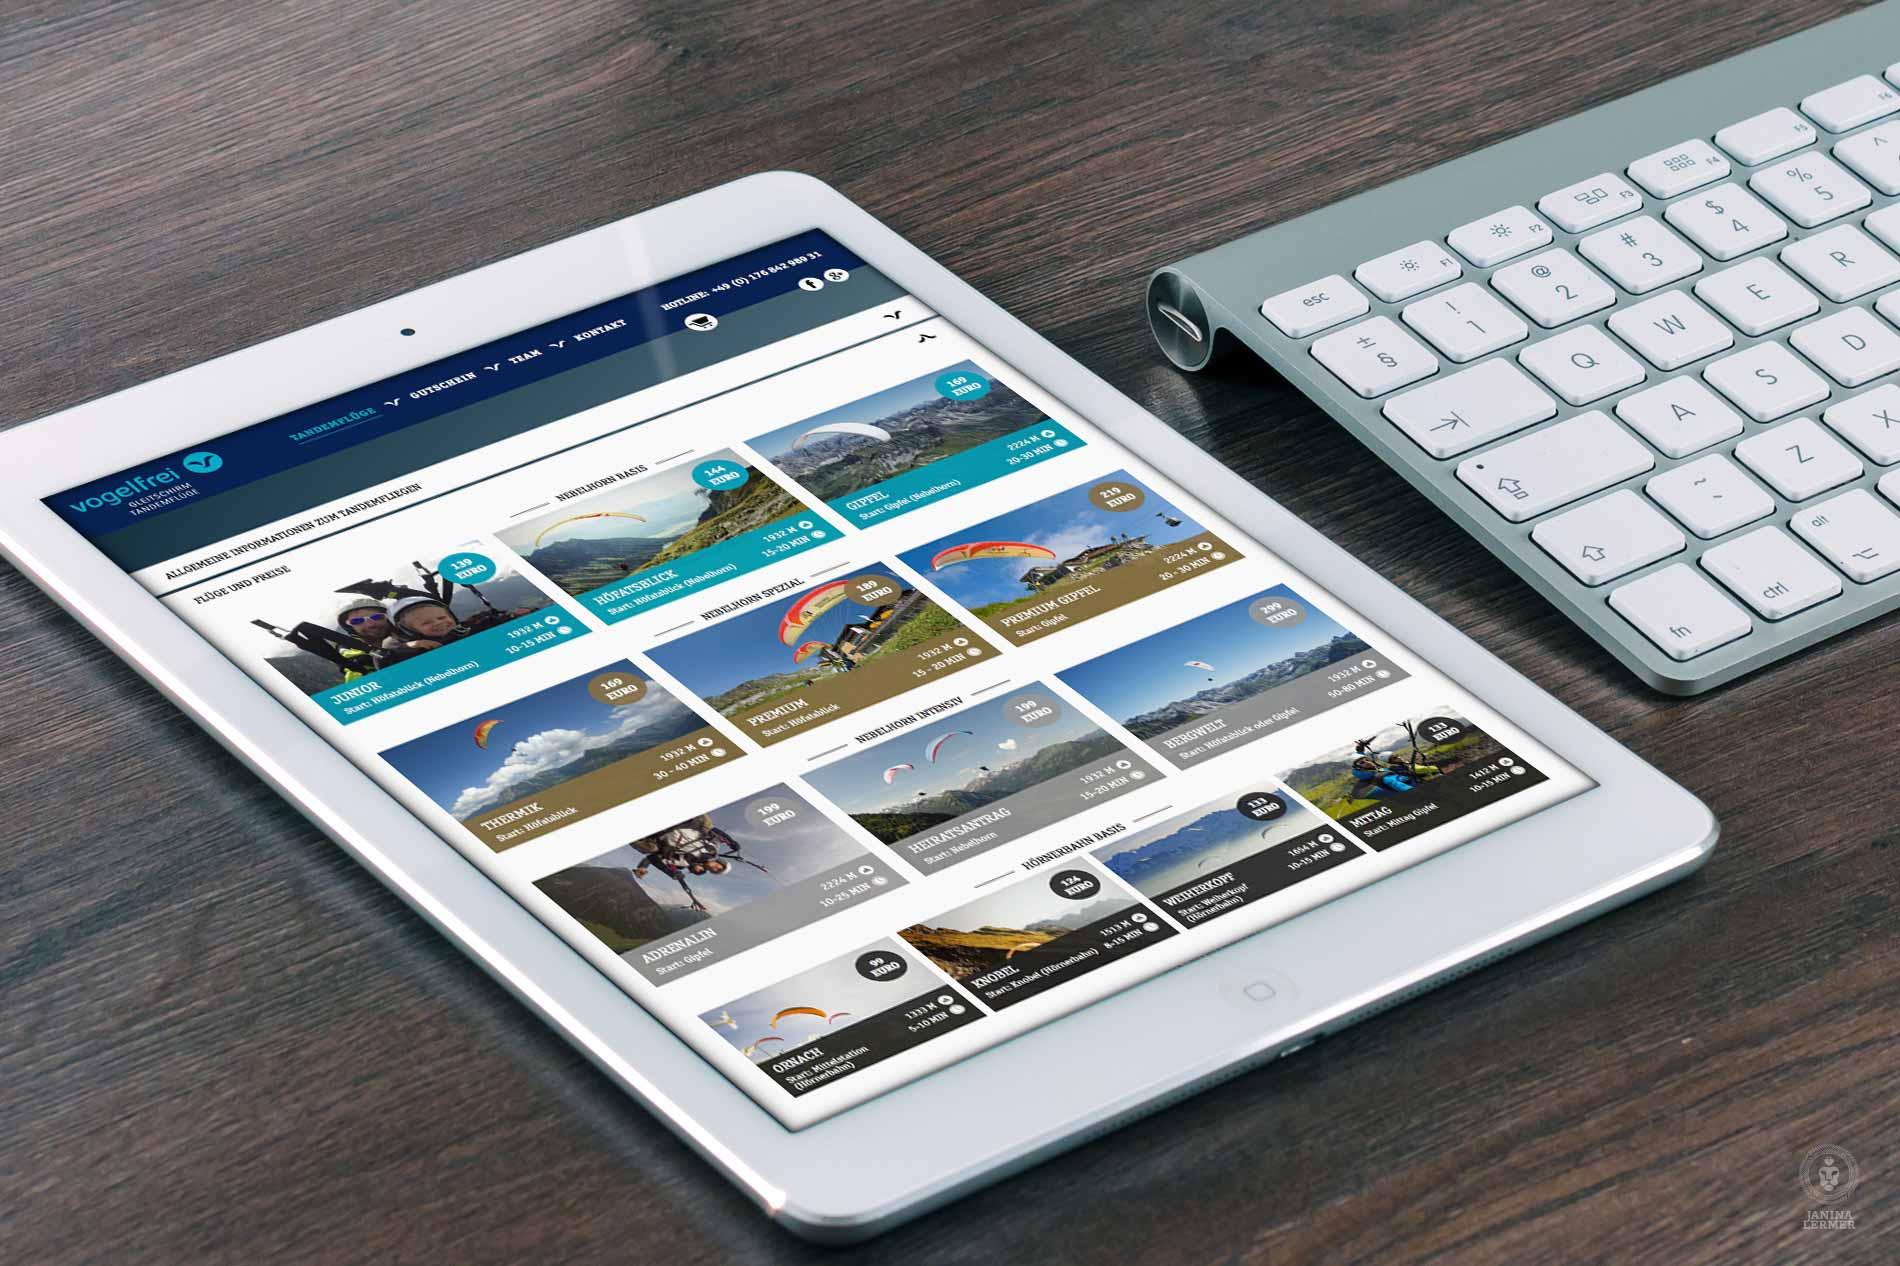 Janina-Lermer-Webseitenkonzept-Webseitengestaltung-Webdesign-Vogelfrei-Tablet-Fluege-Flights